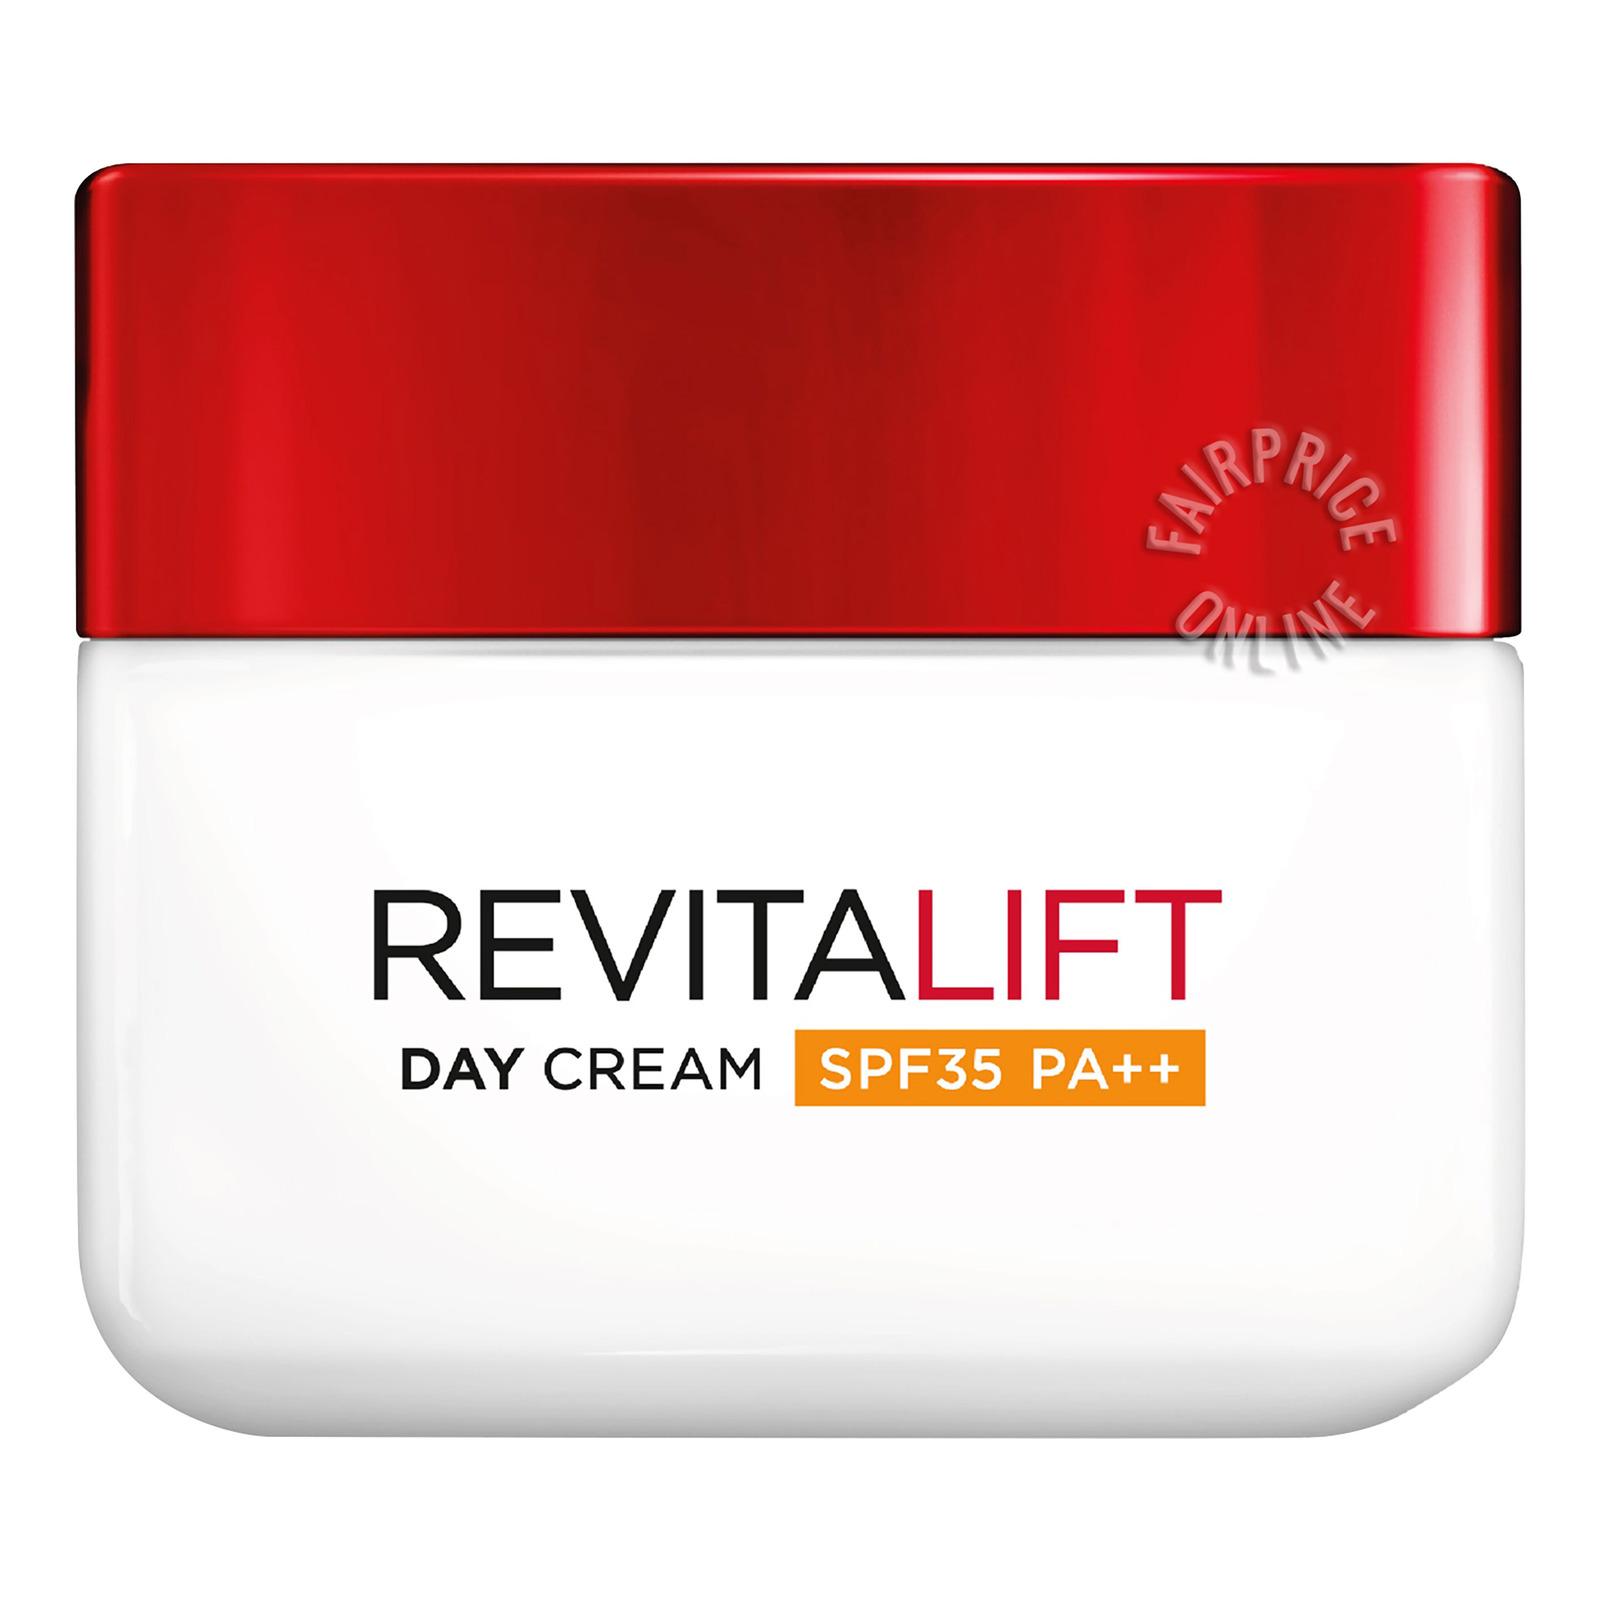 L'Oreal Paris Day Cream - Revitalift SPF 23 PA++